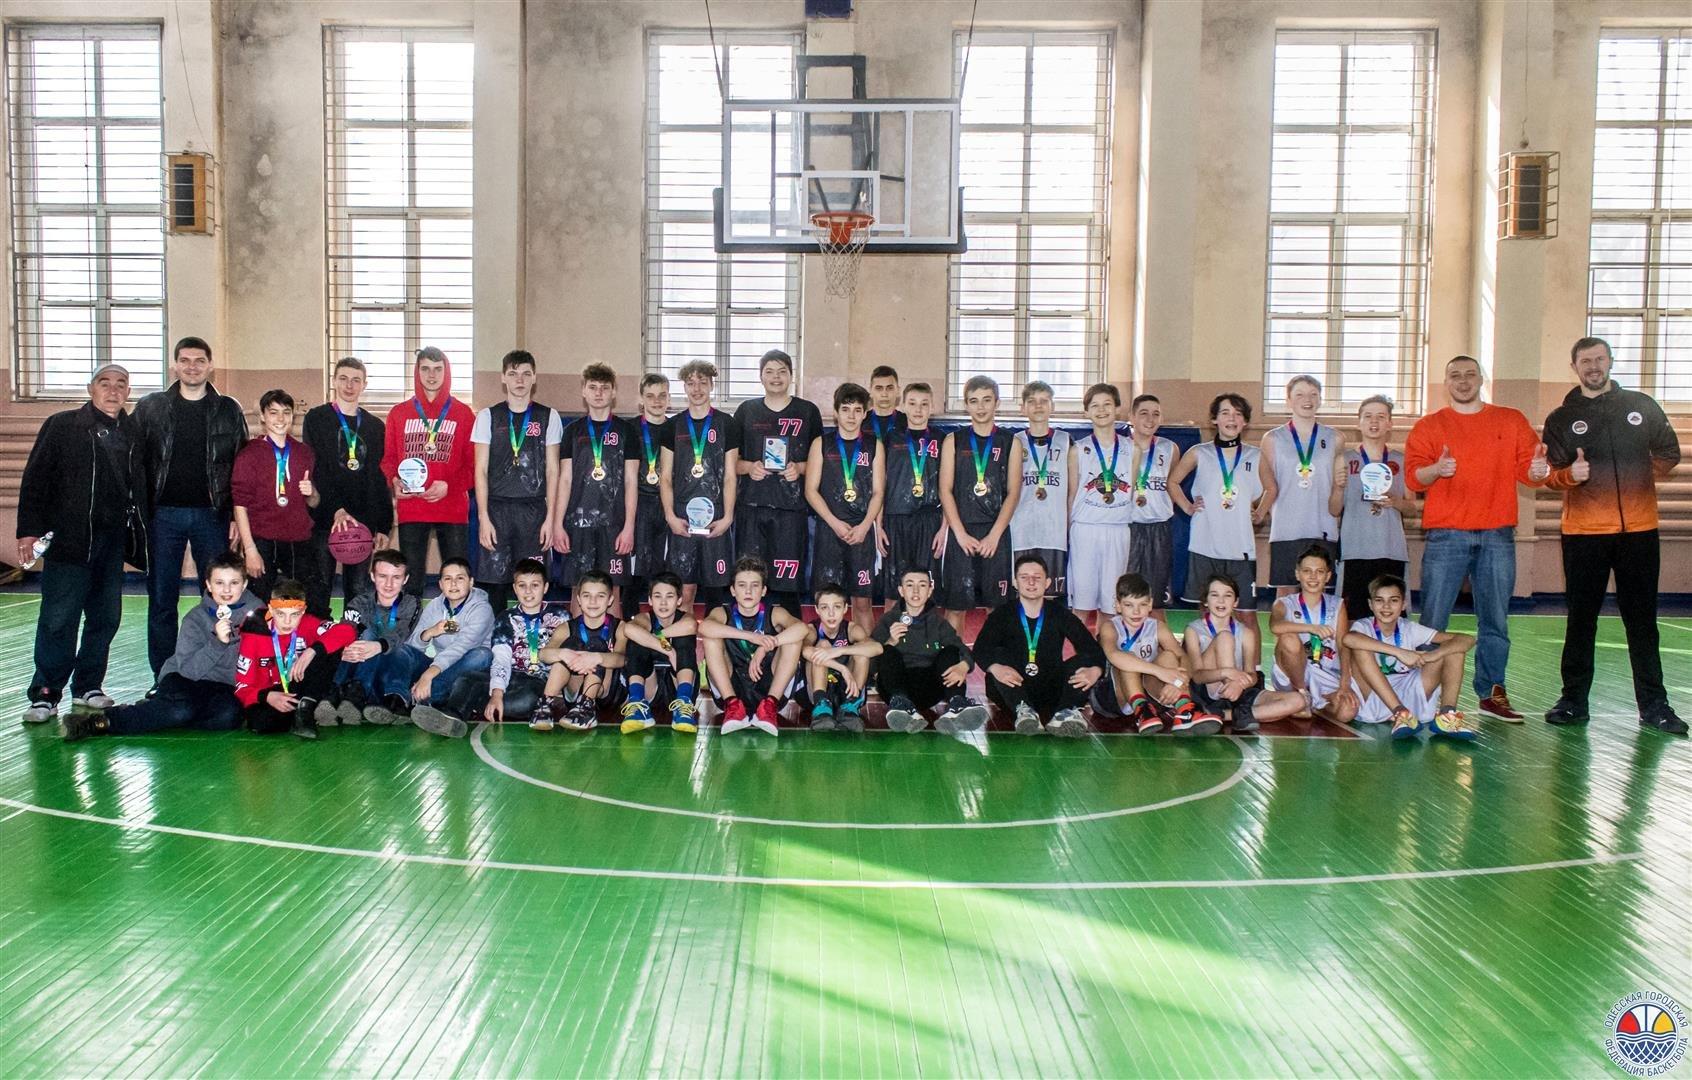 09-11.03.2021 Litvak Basketball Memorial - Boys 2007